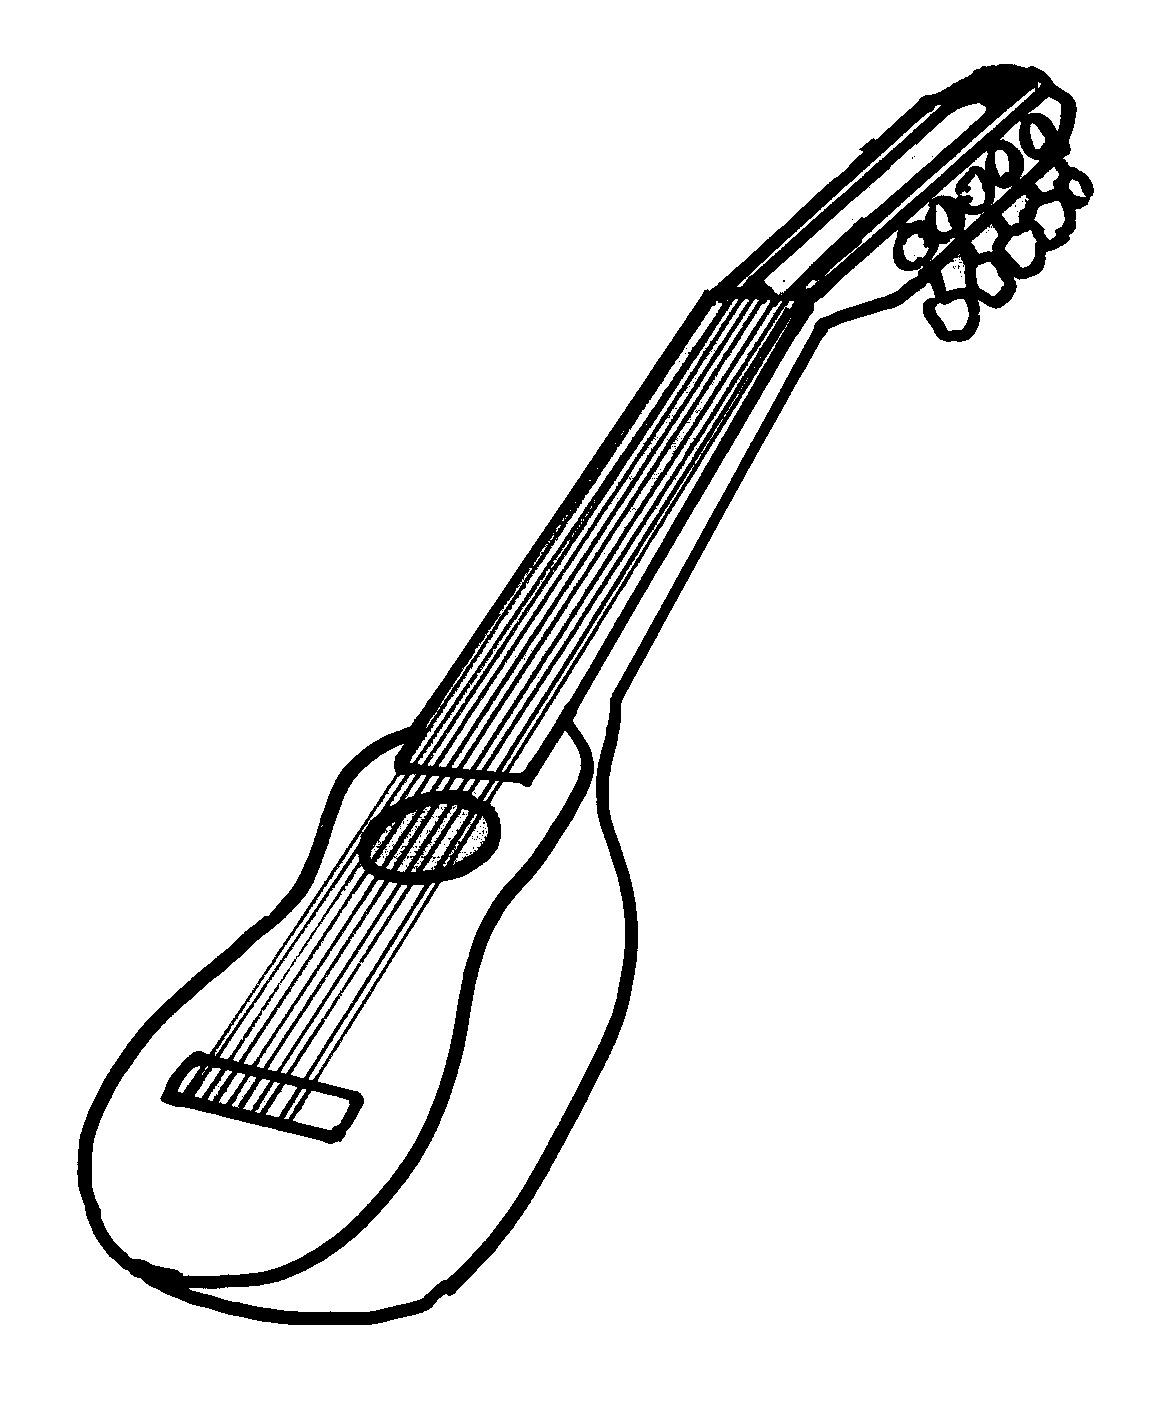 Dibujos Para Colorear E Imprimir Instrumentos Musicales ~ Ideas ...